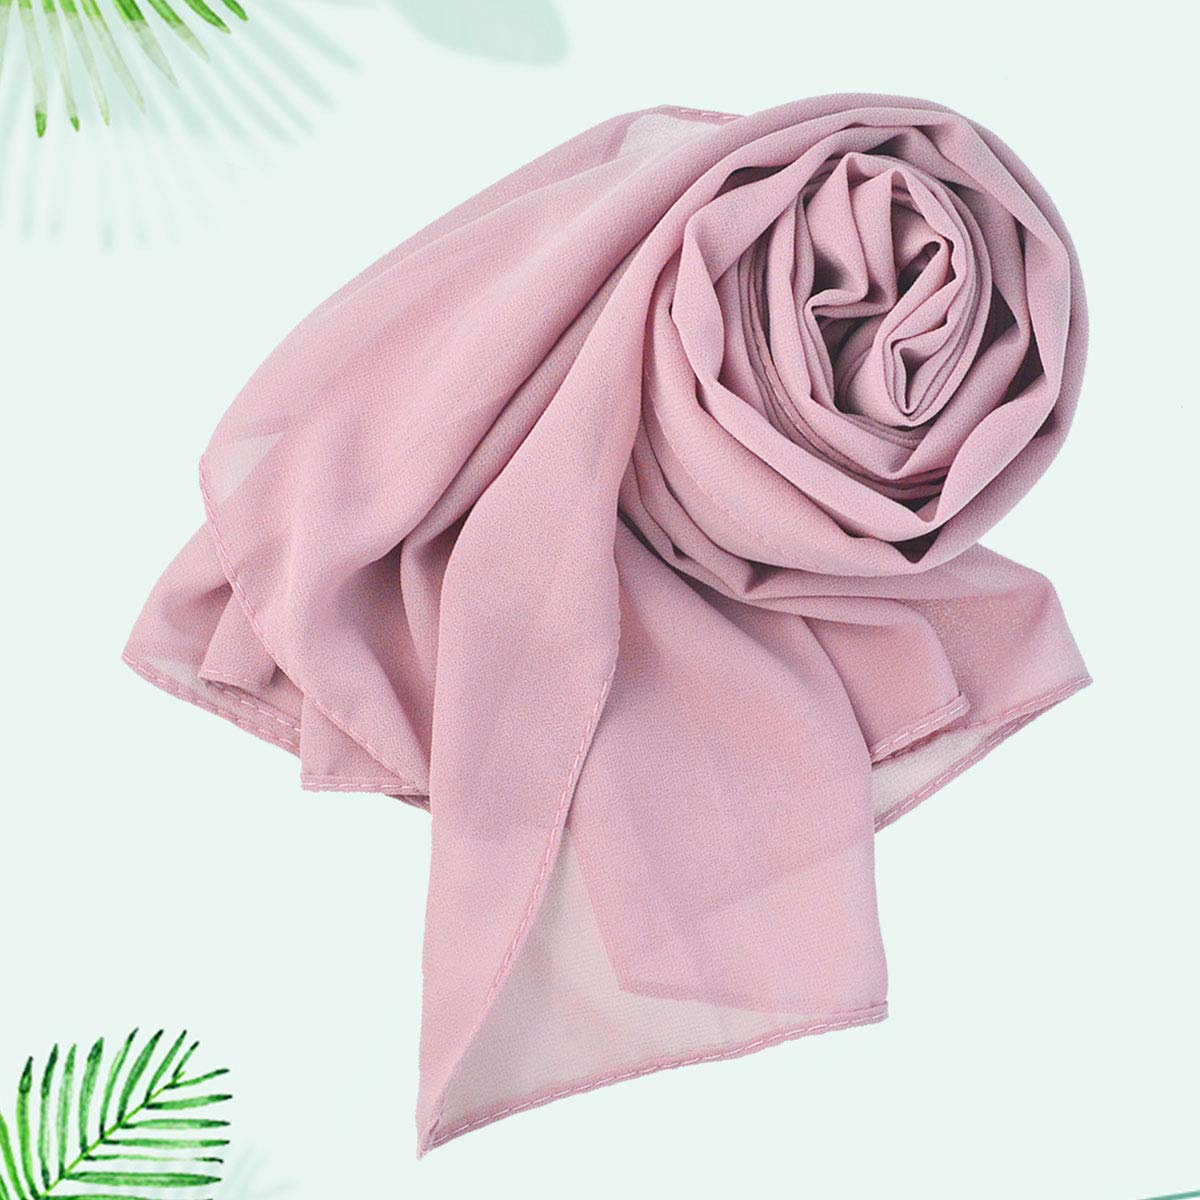 Wobe 3pcs Women Soft Chiffon Scarves Shawl Long Scarf, Travel Sunscreen Summer Beach Cover Wrap Bridal Hijab Scarf Muslin Head Scarves by Wobe (Image #5)